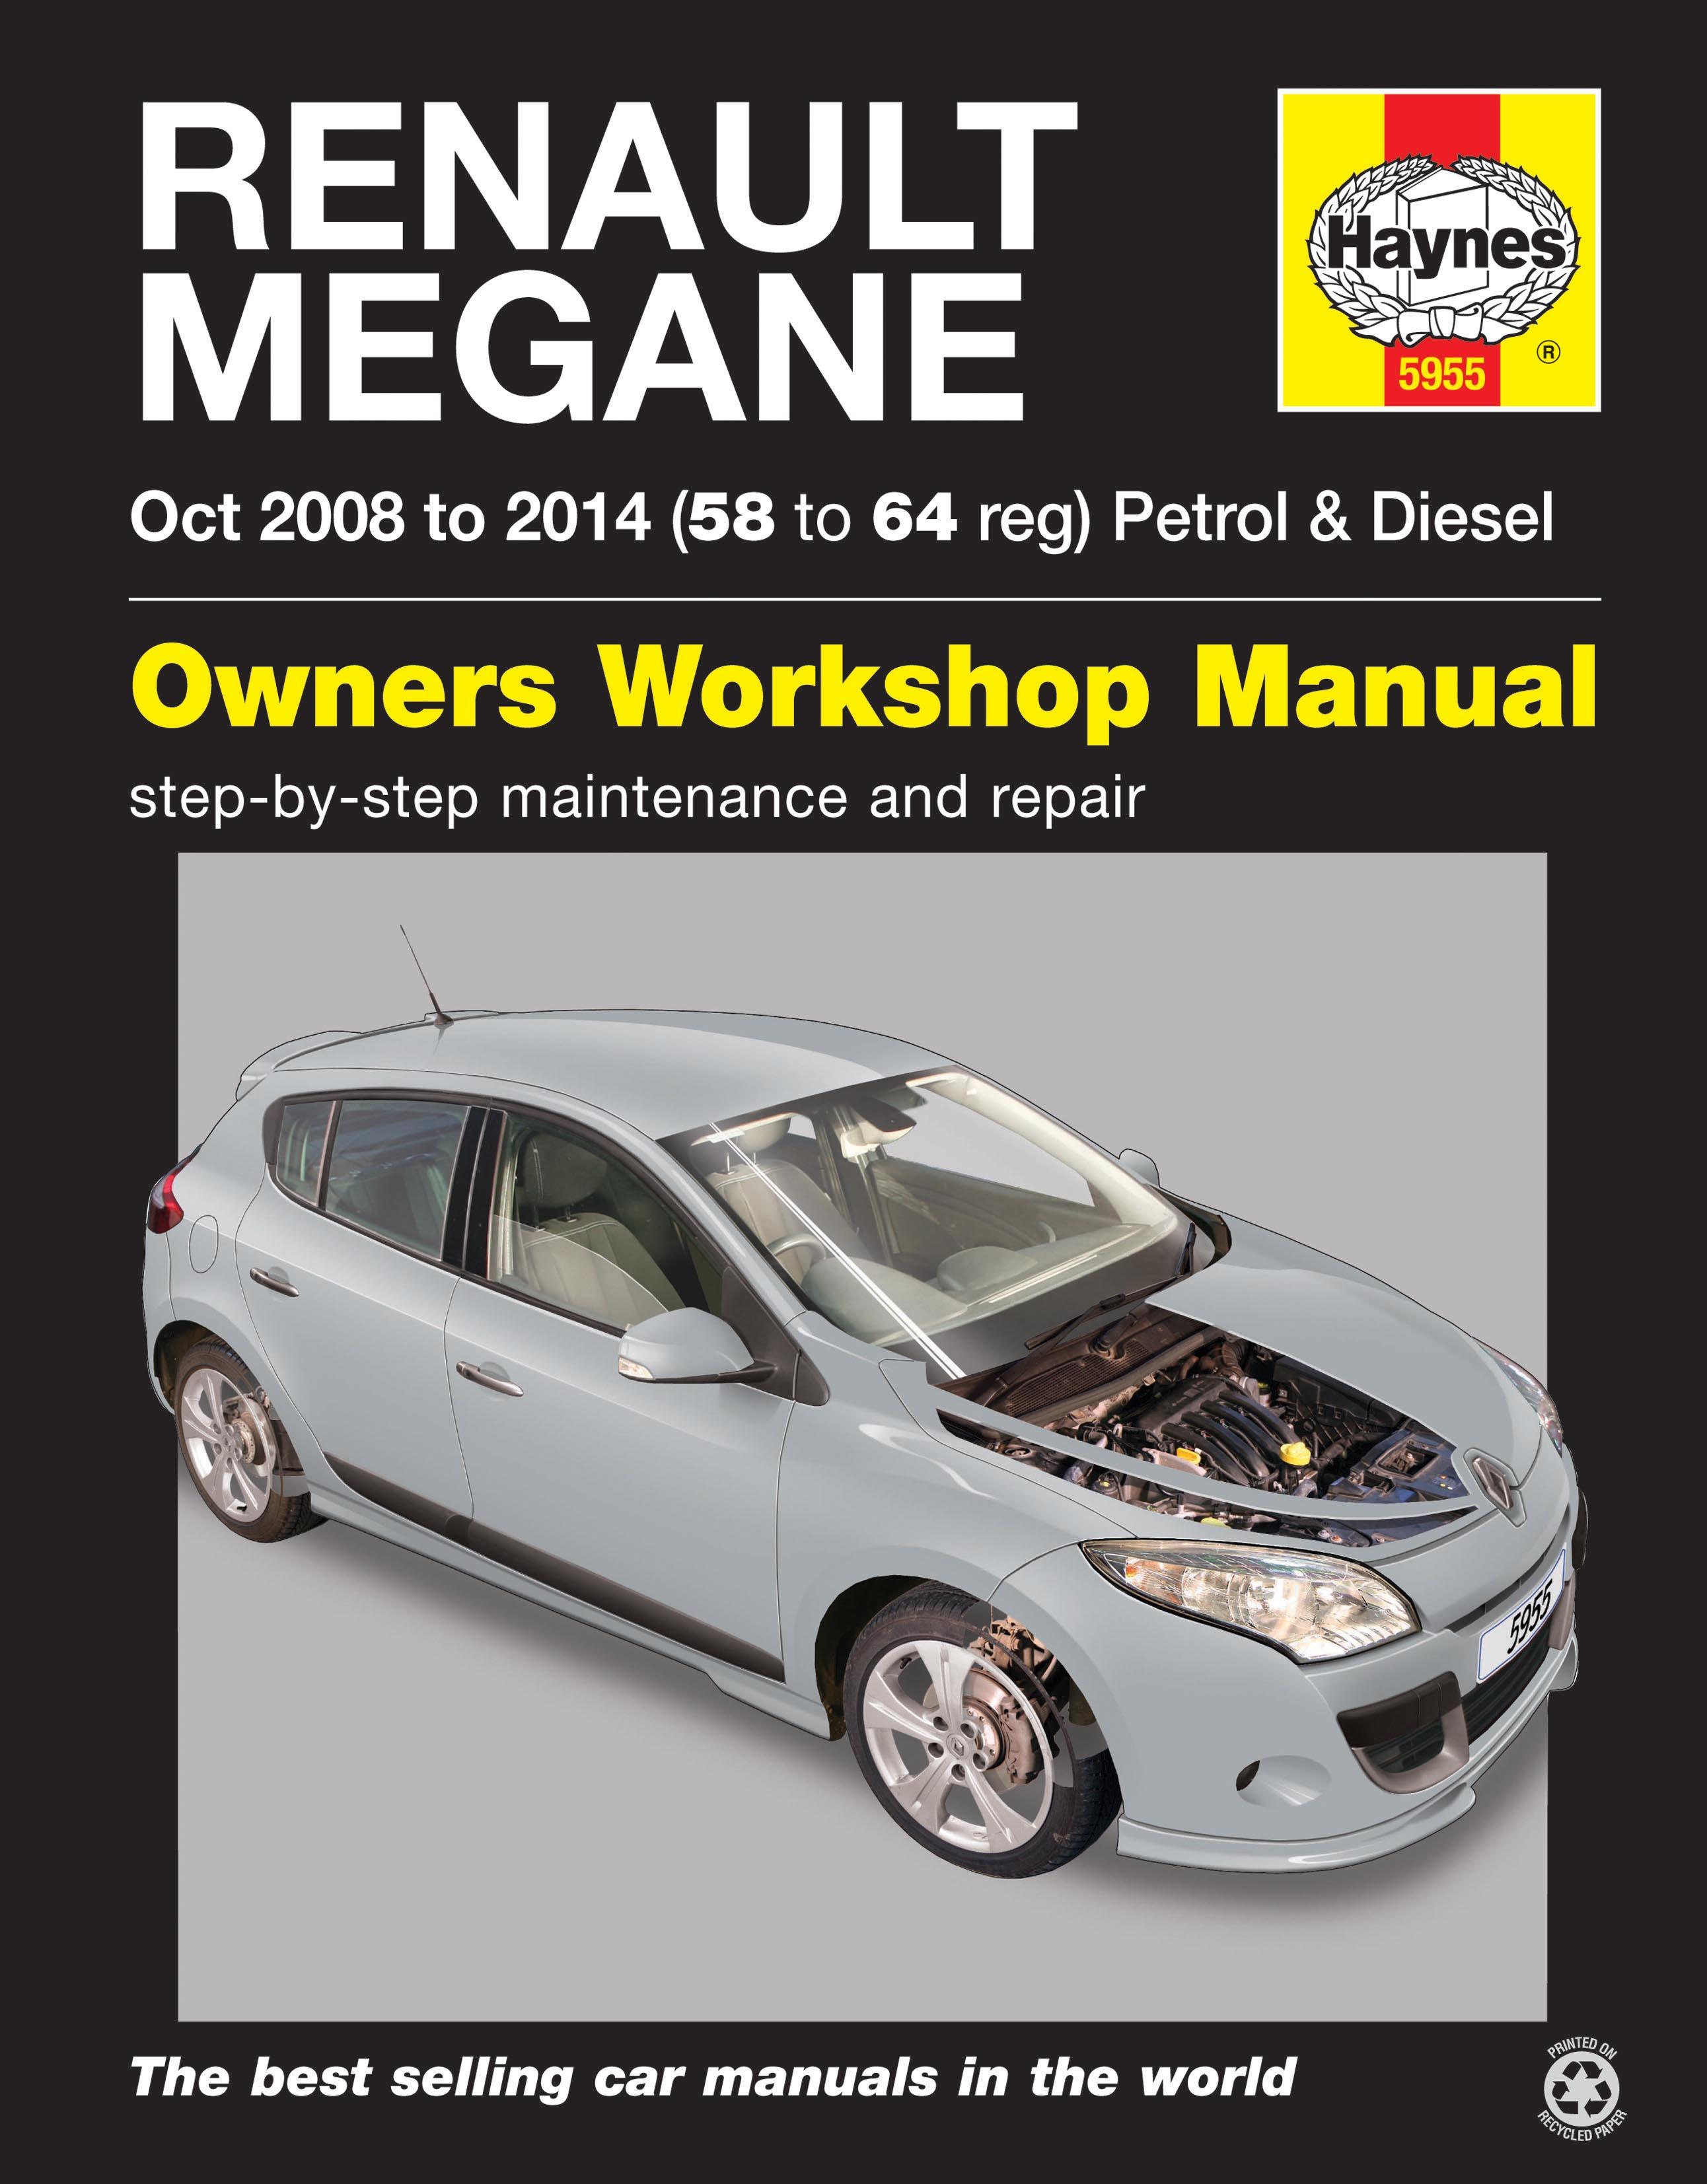 Renault Megane  Oct  U0026 39 08- U0026 39 14